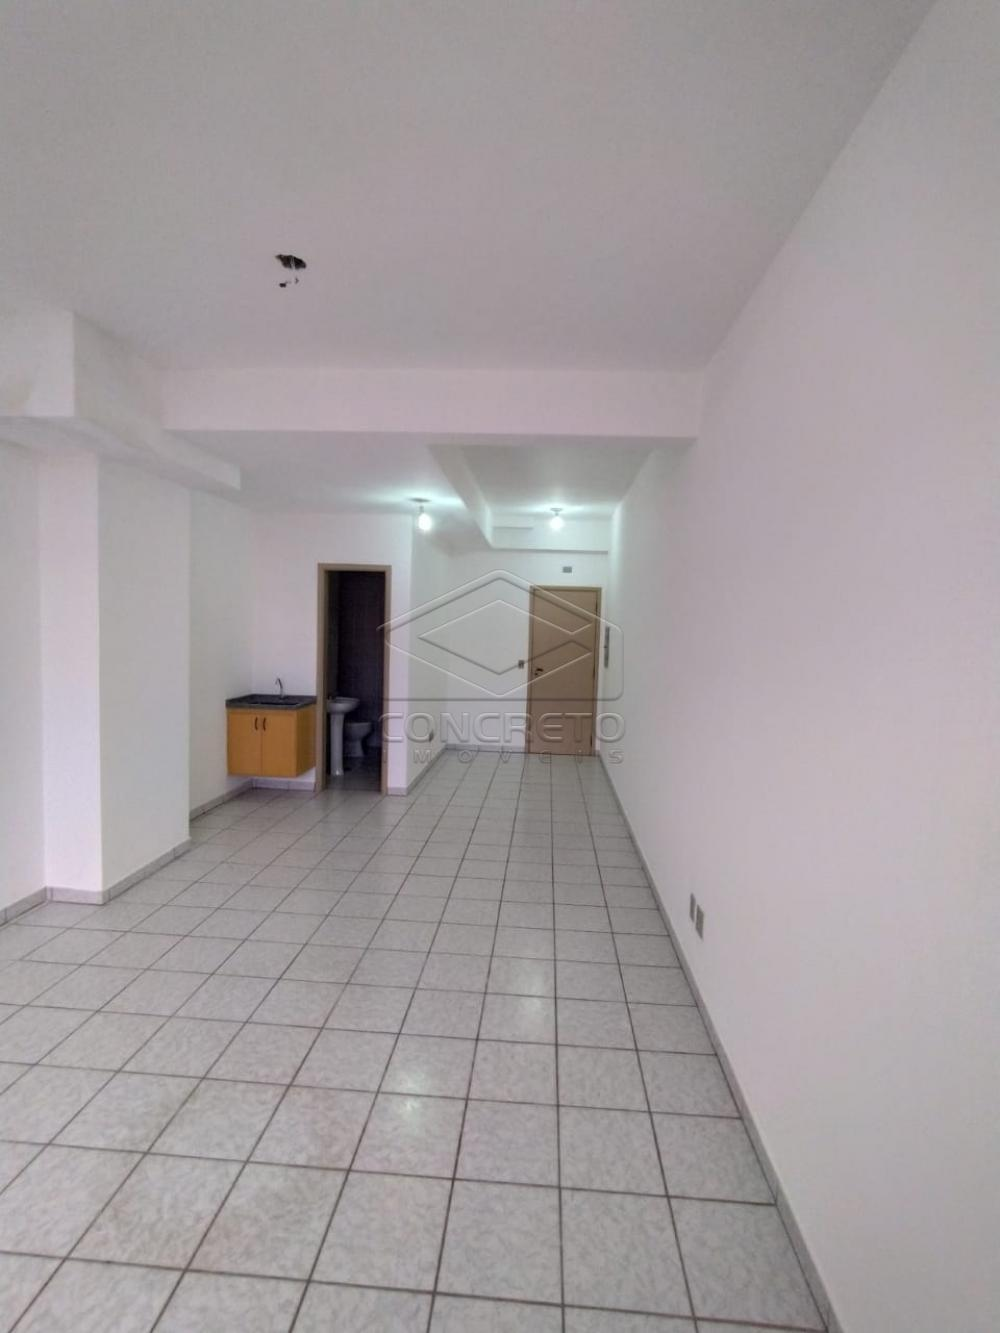 Alugar Comercial / Sala em Bauru R$ 700,00 - Foto 4